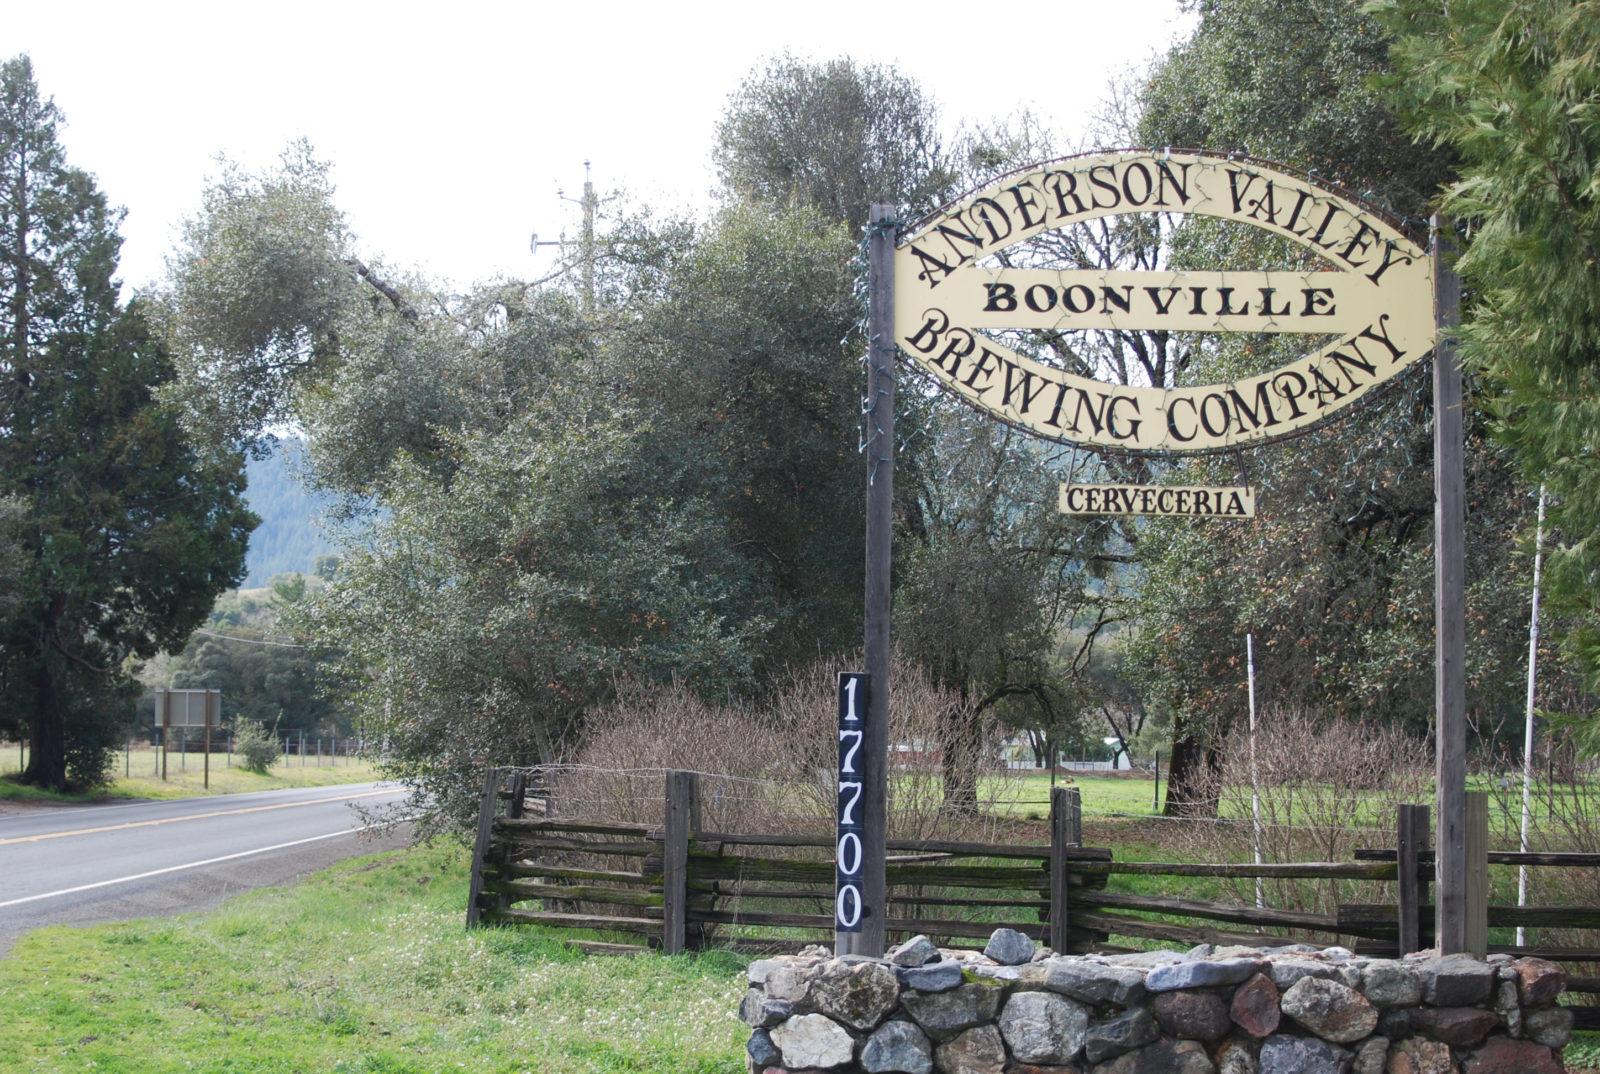 Anderson Valley, Booneville, CA